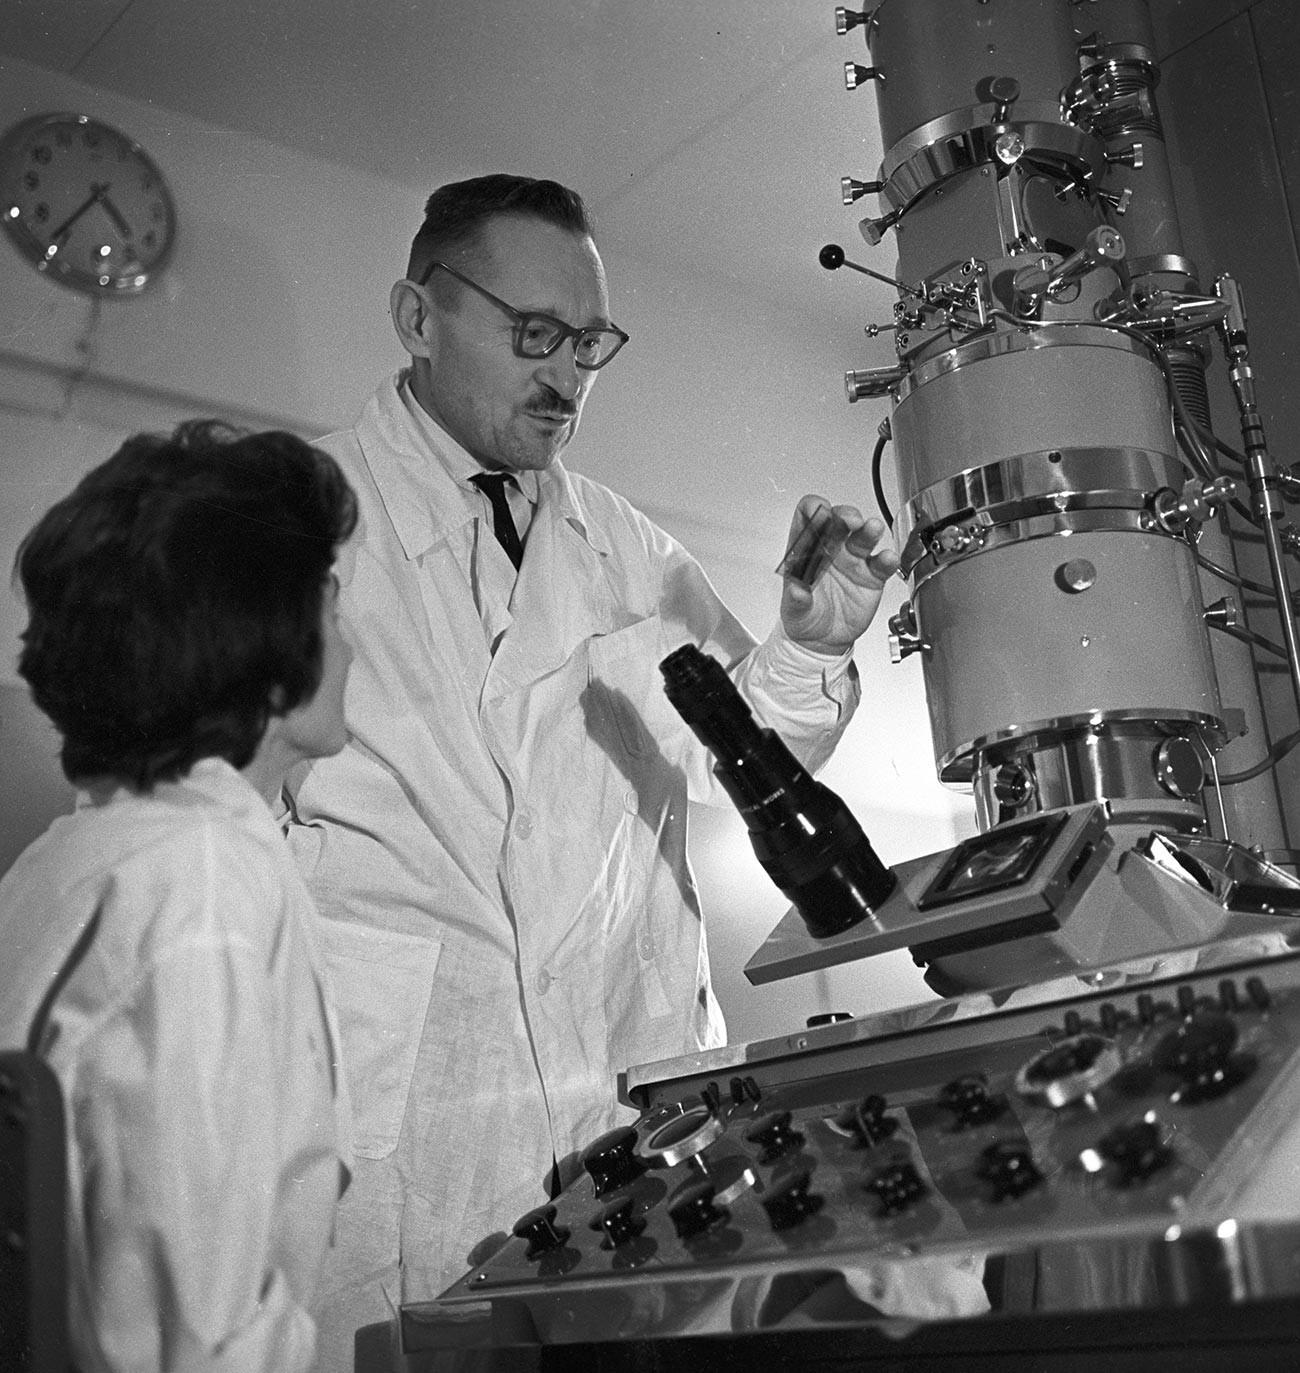 El científico soviético Viktor M. Zhdanov